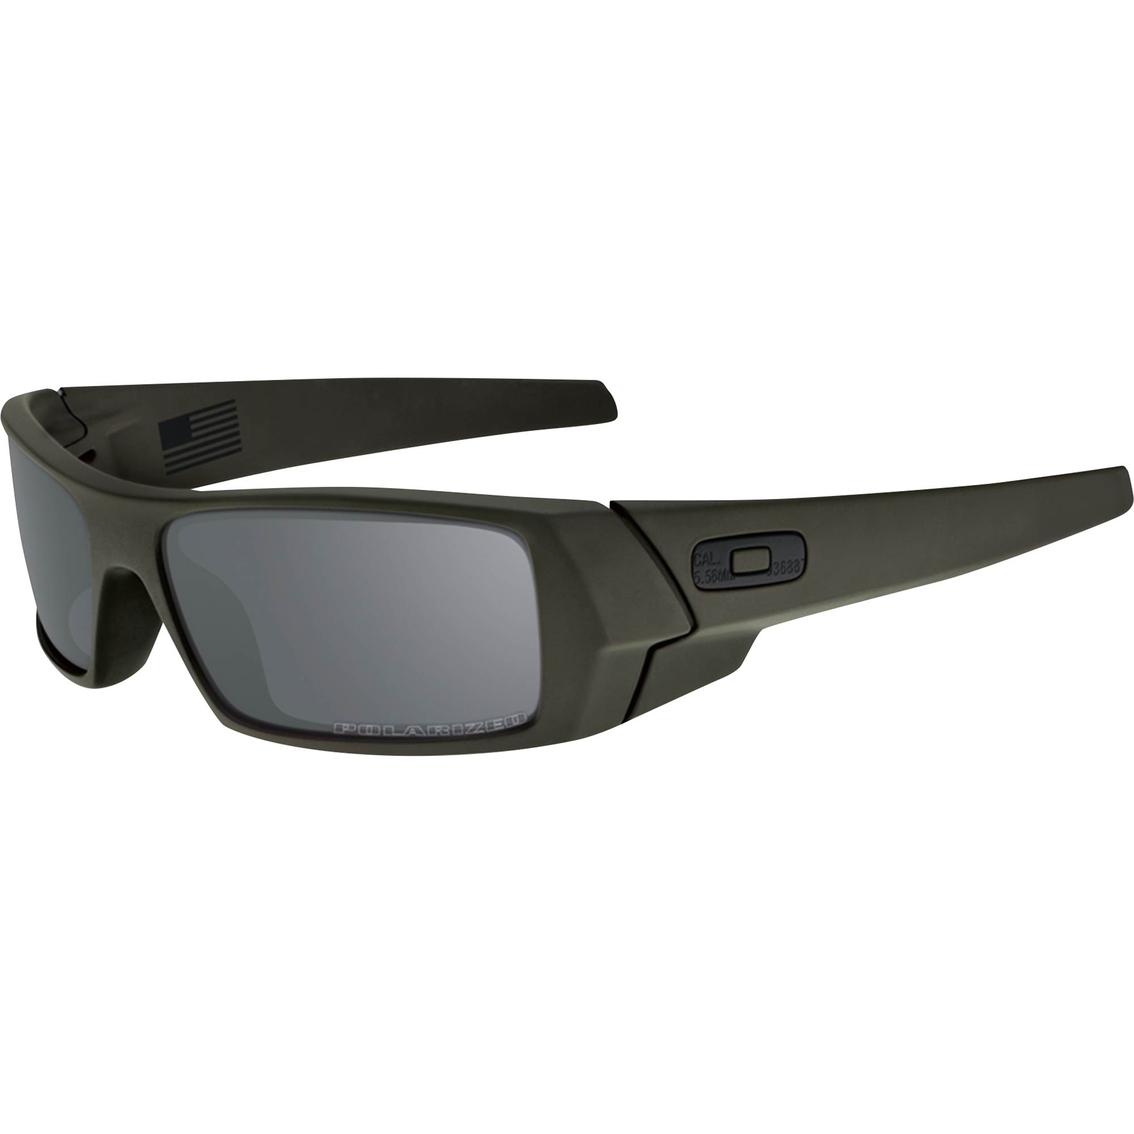 41cd873f354a Oakley 53-110 Si Gascan Cerakote Iridium Lens Polarized Sunglasses ...